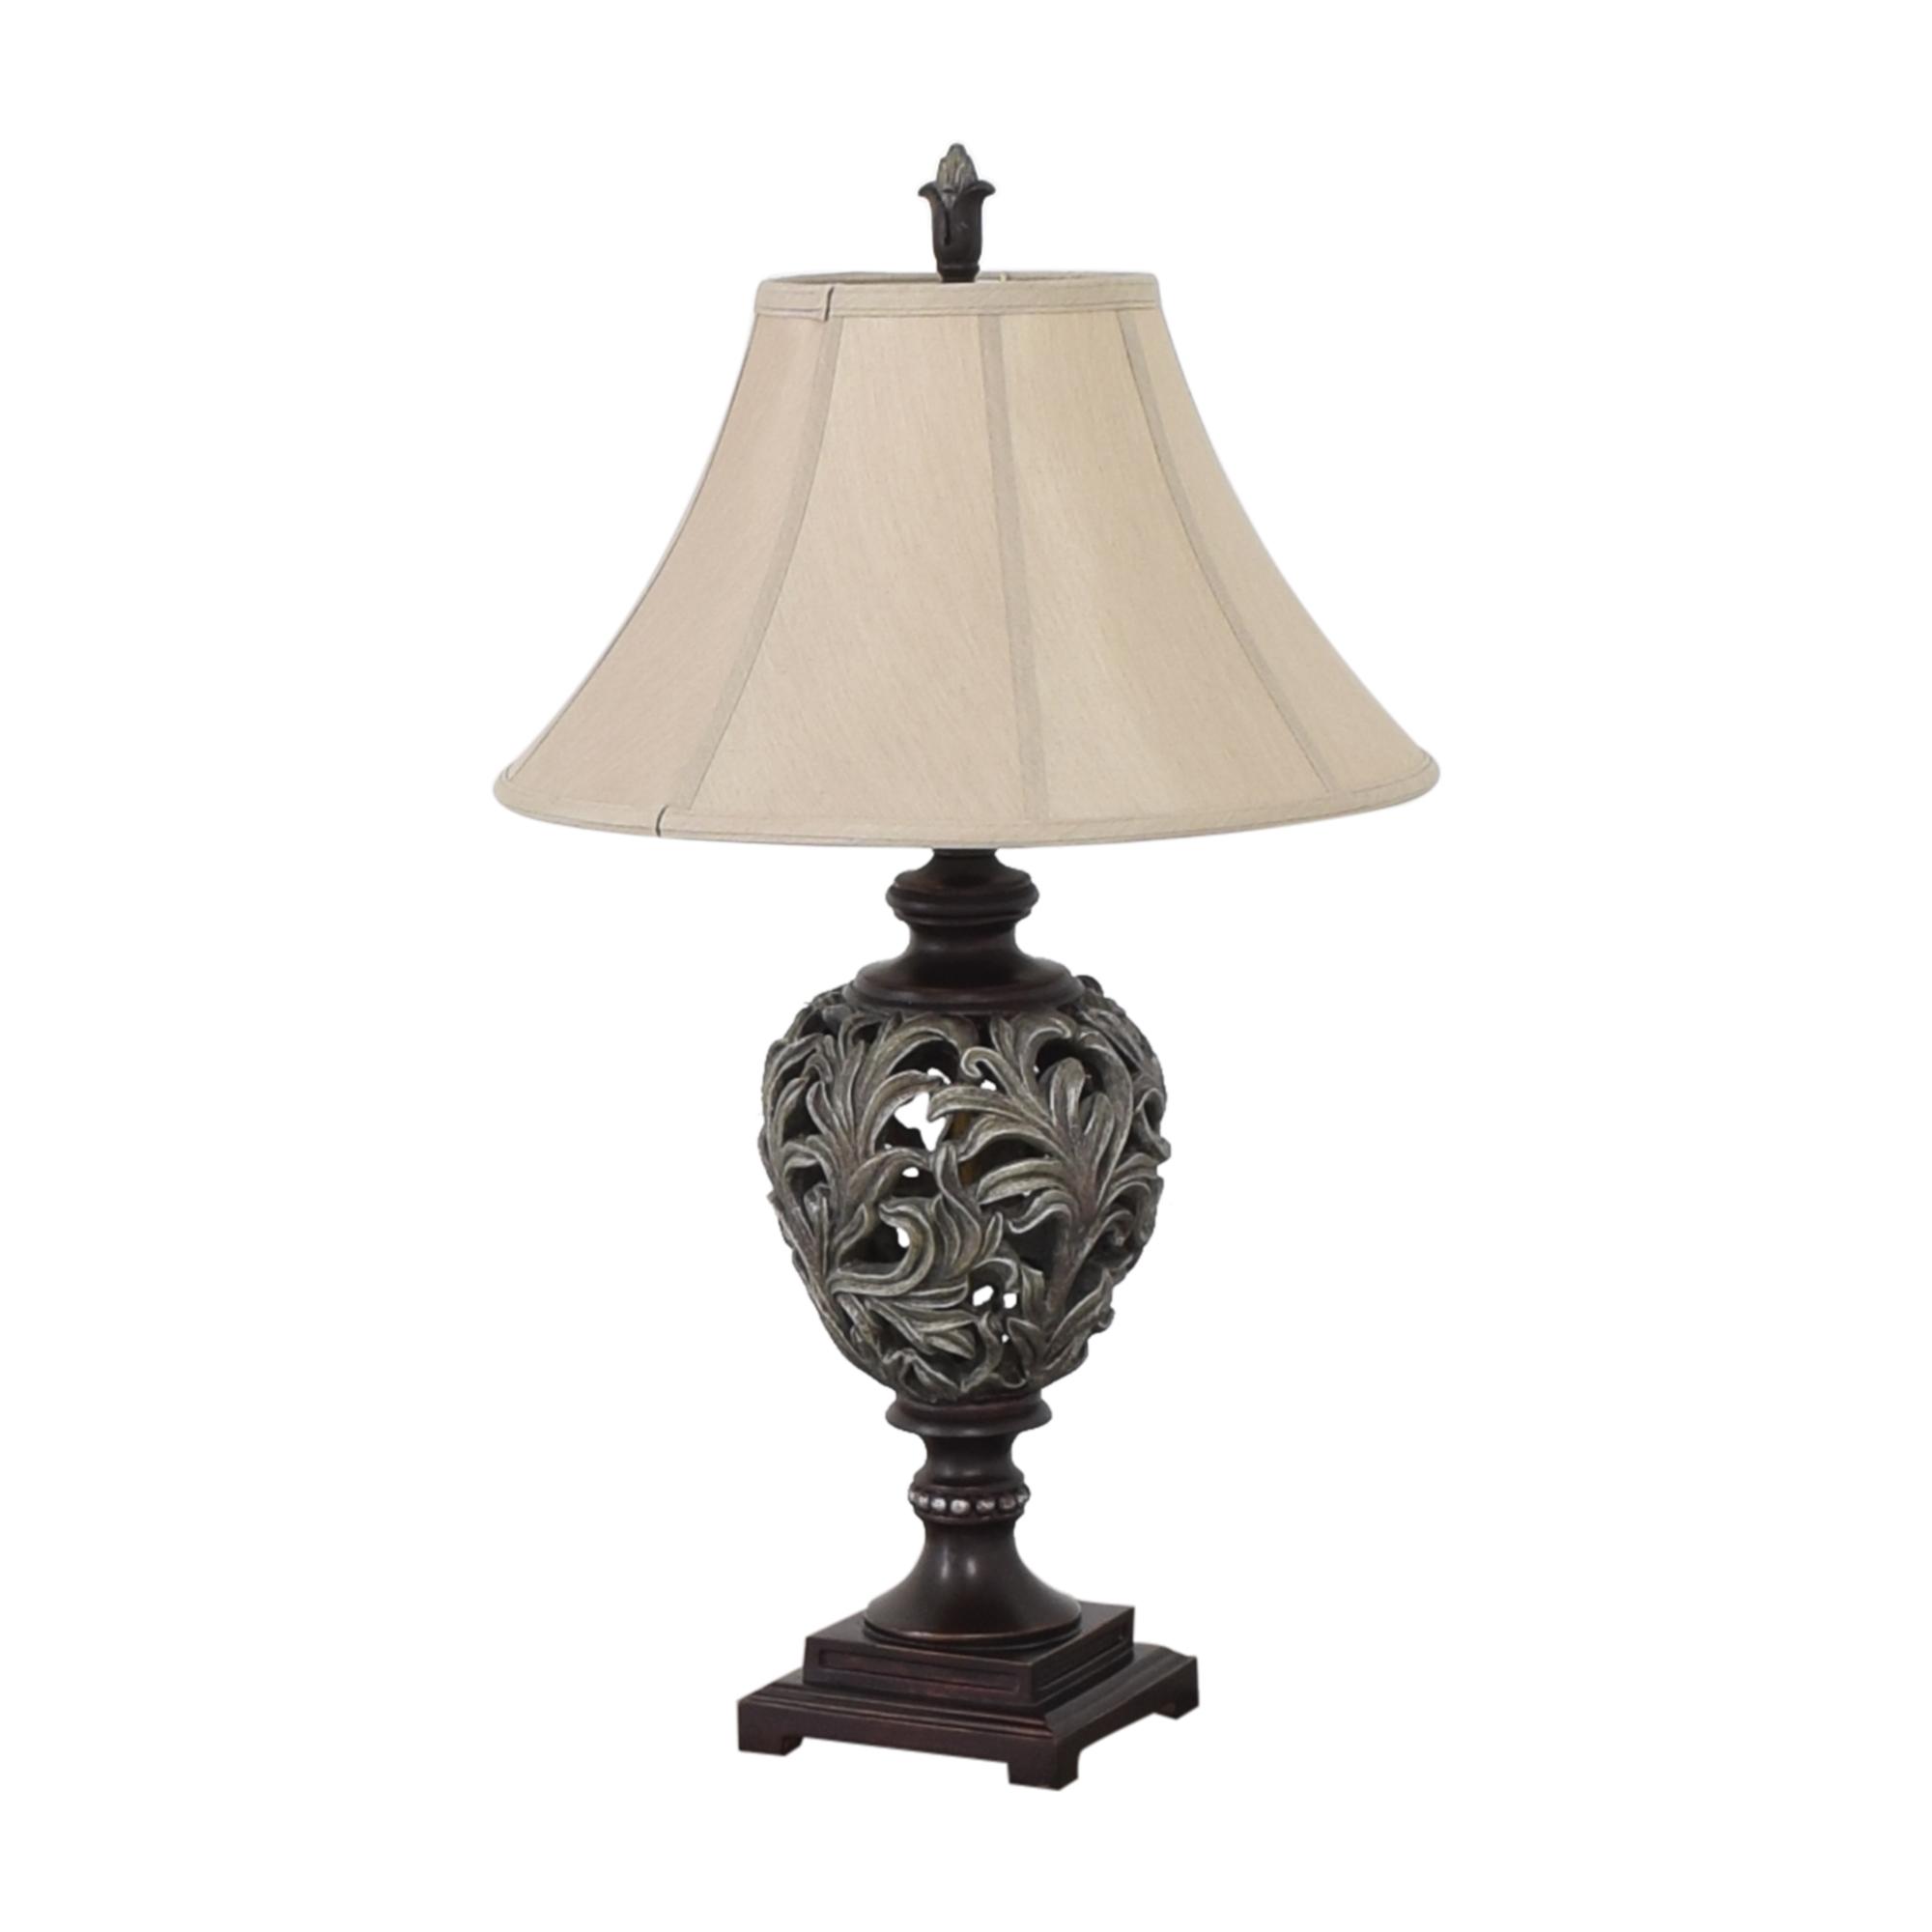 Ashley Furniture Ashley Furniture Deborah Table Lamp ma